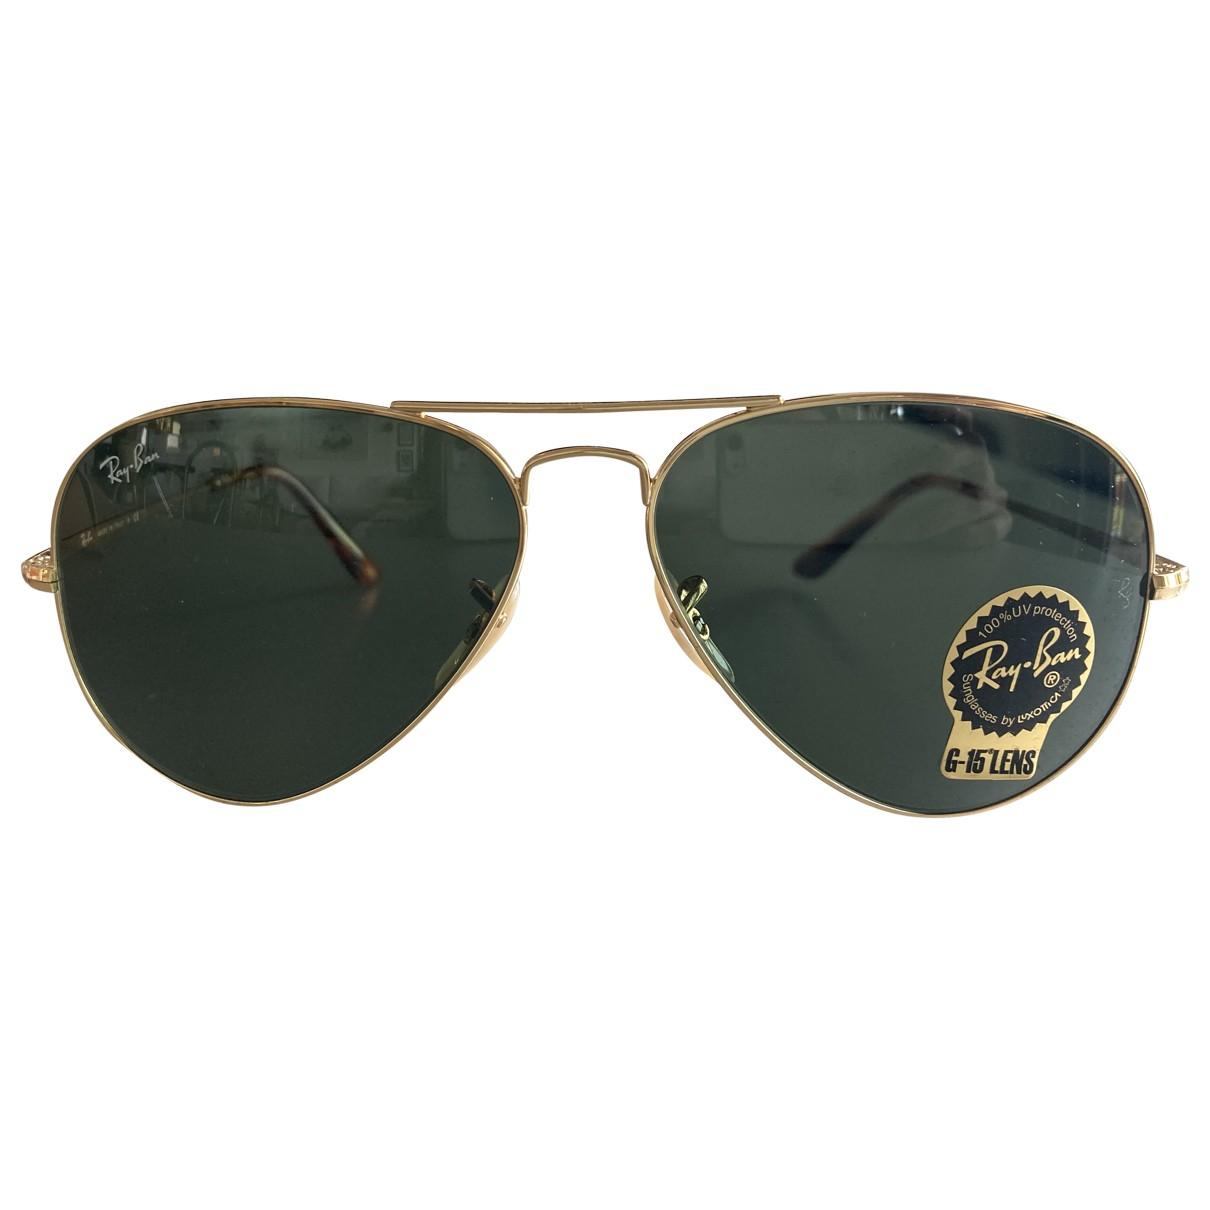 Ray-ban Aviator Sonnenbrillen in  Gold Metall